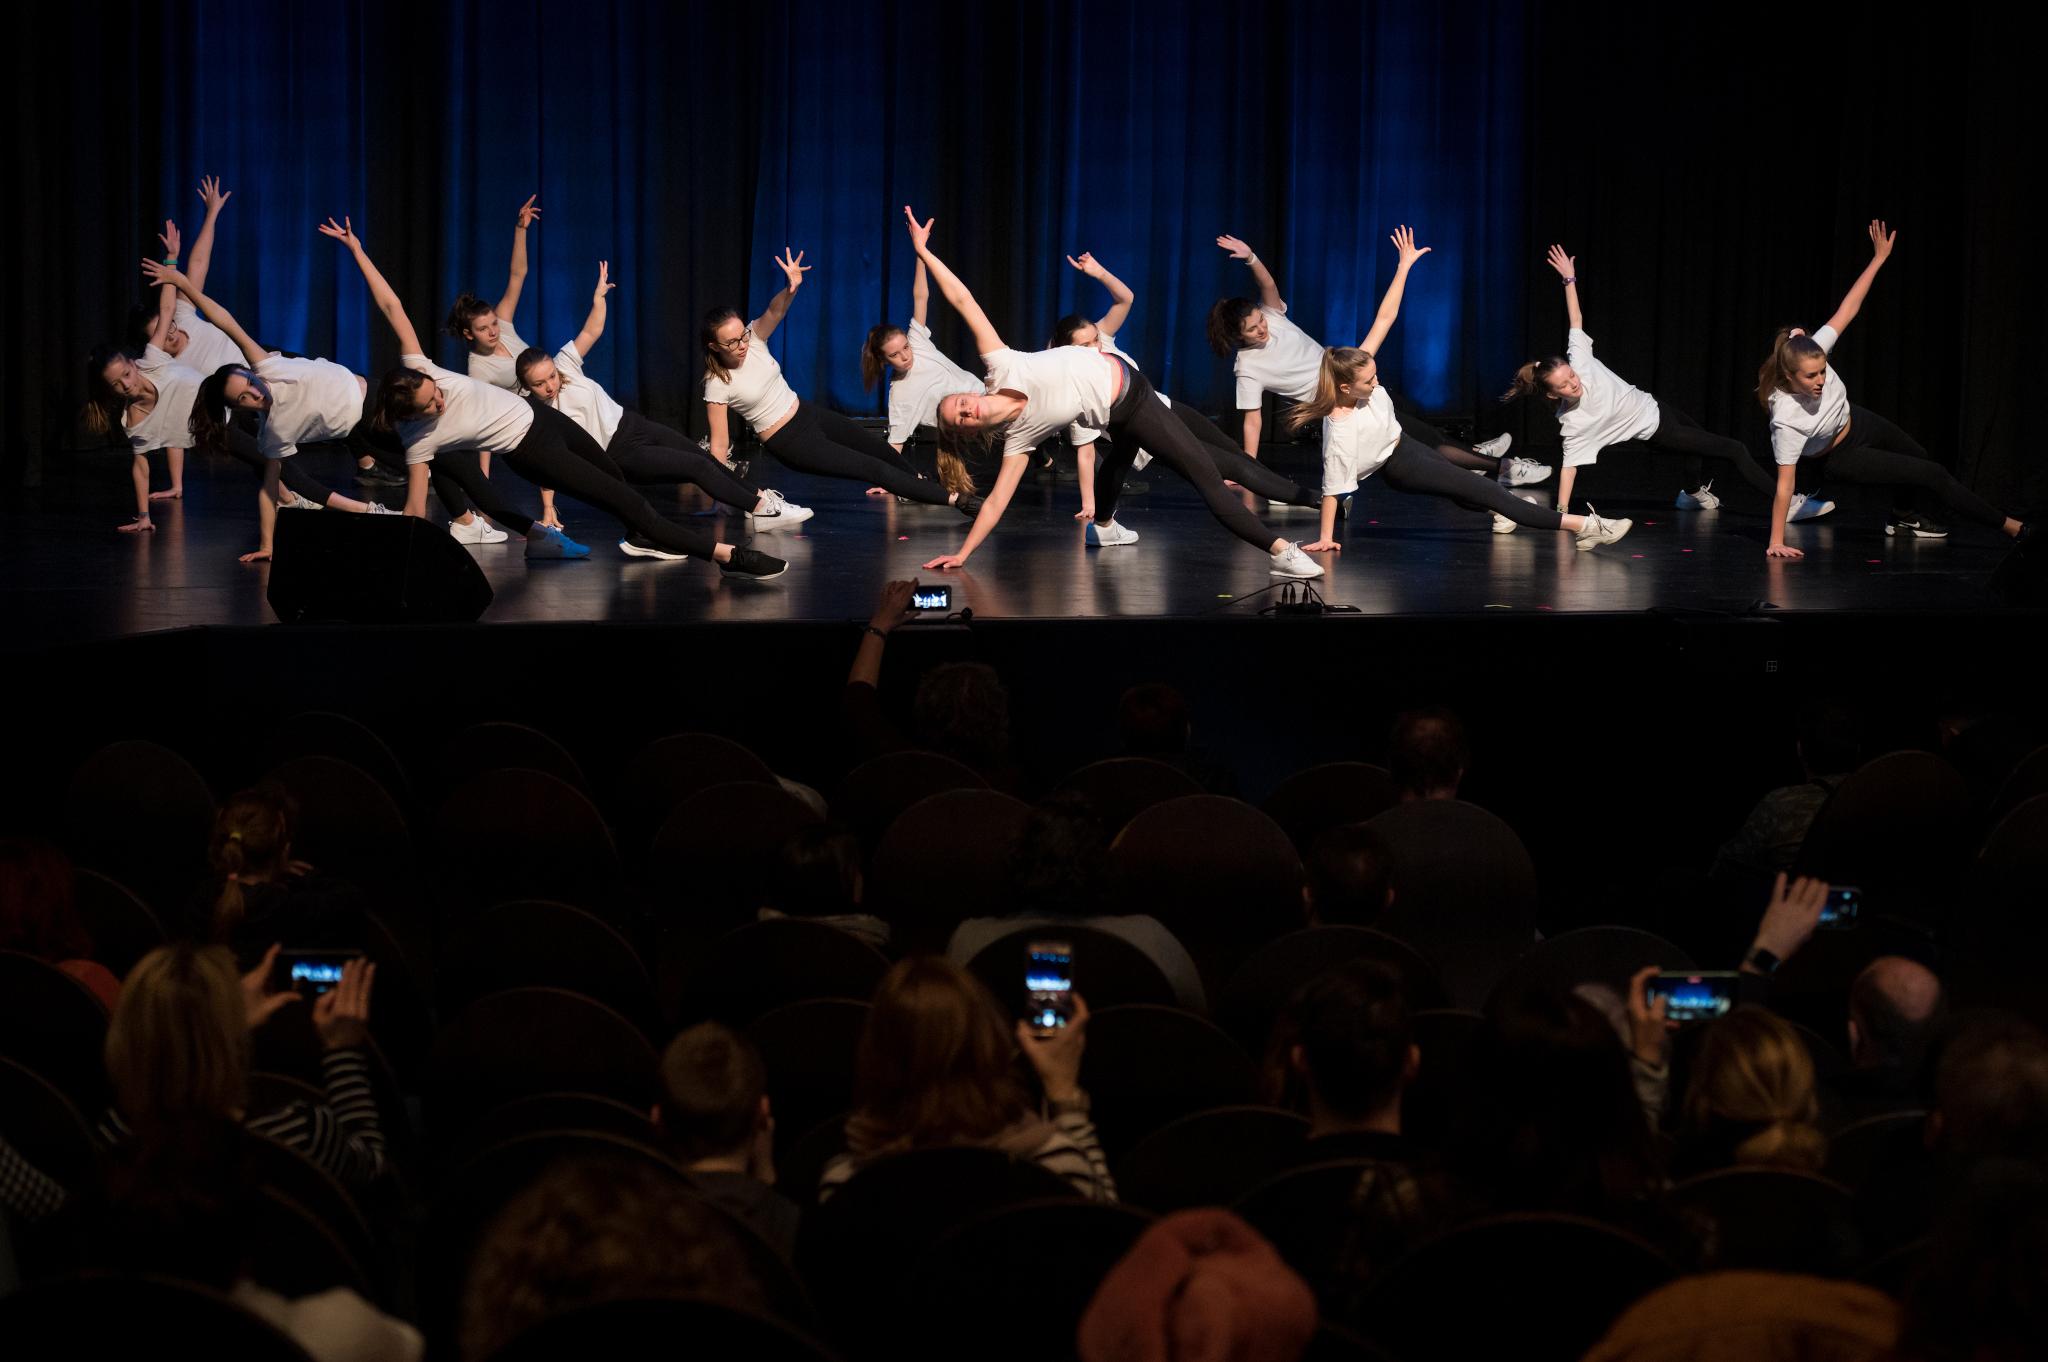 jugendkulturjahr-2020-ratingen-jkj2020-YouthDay-TanzschuleAmWall01